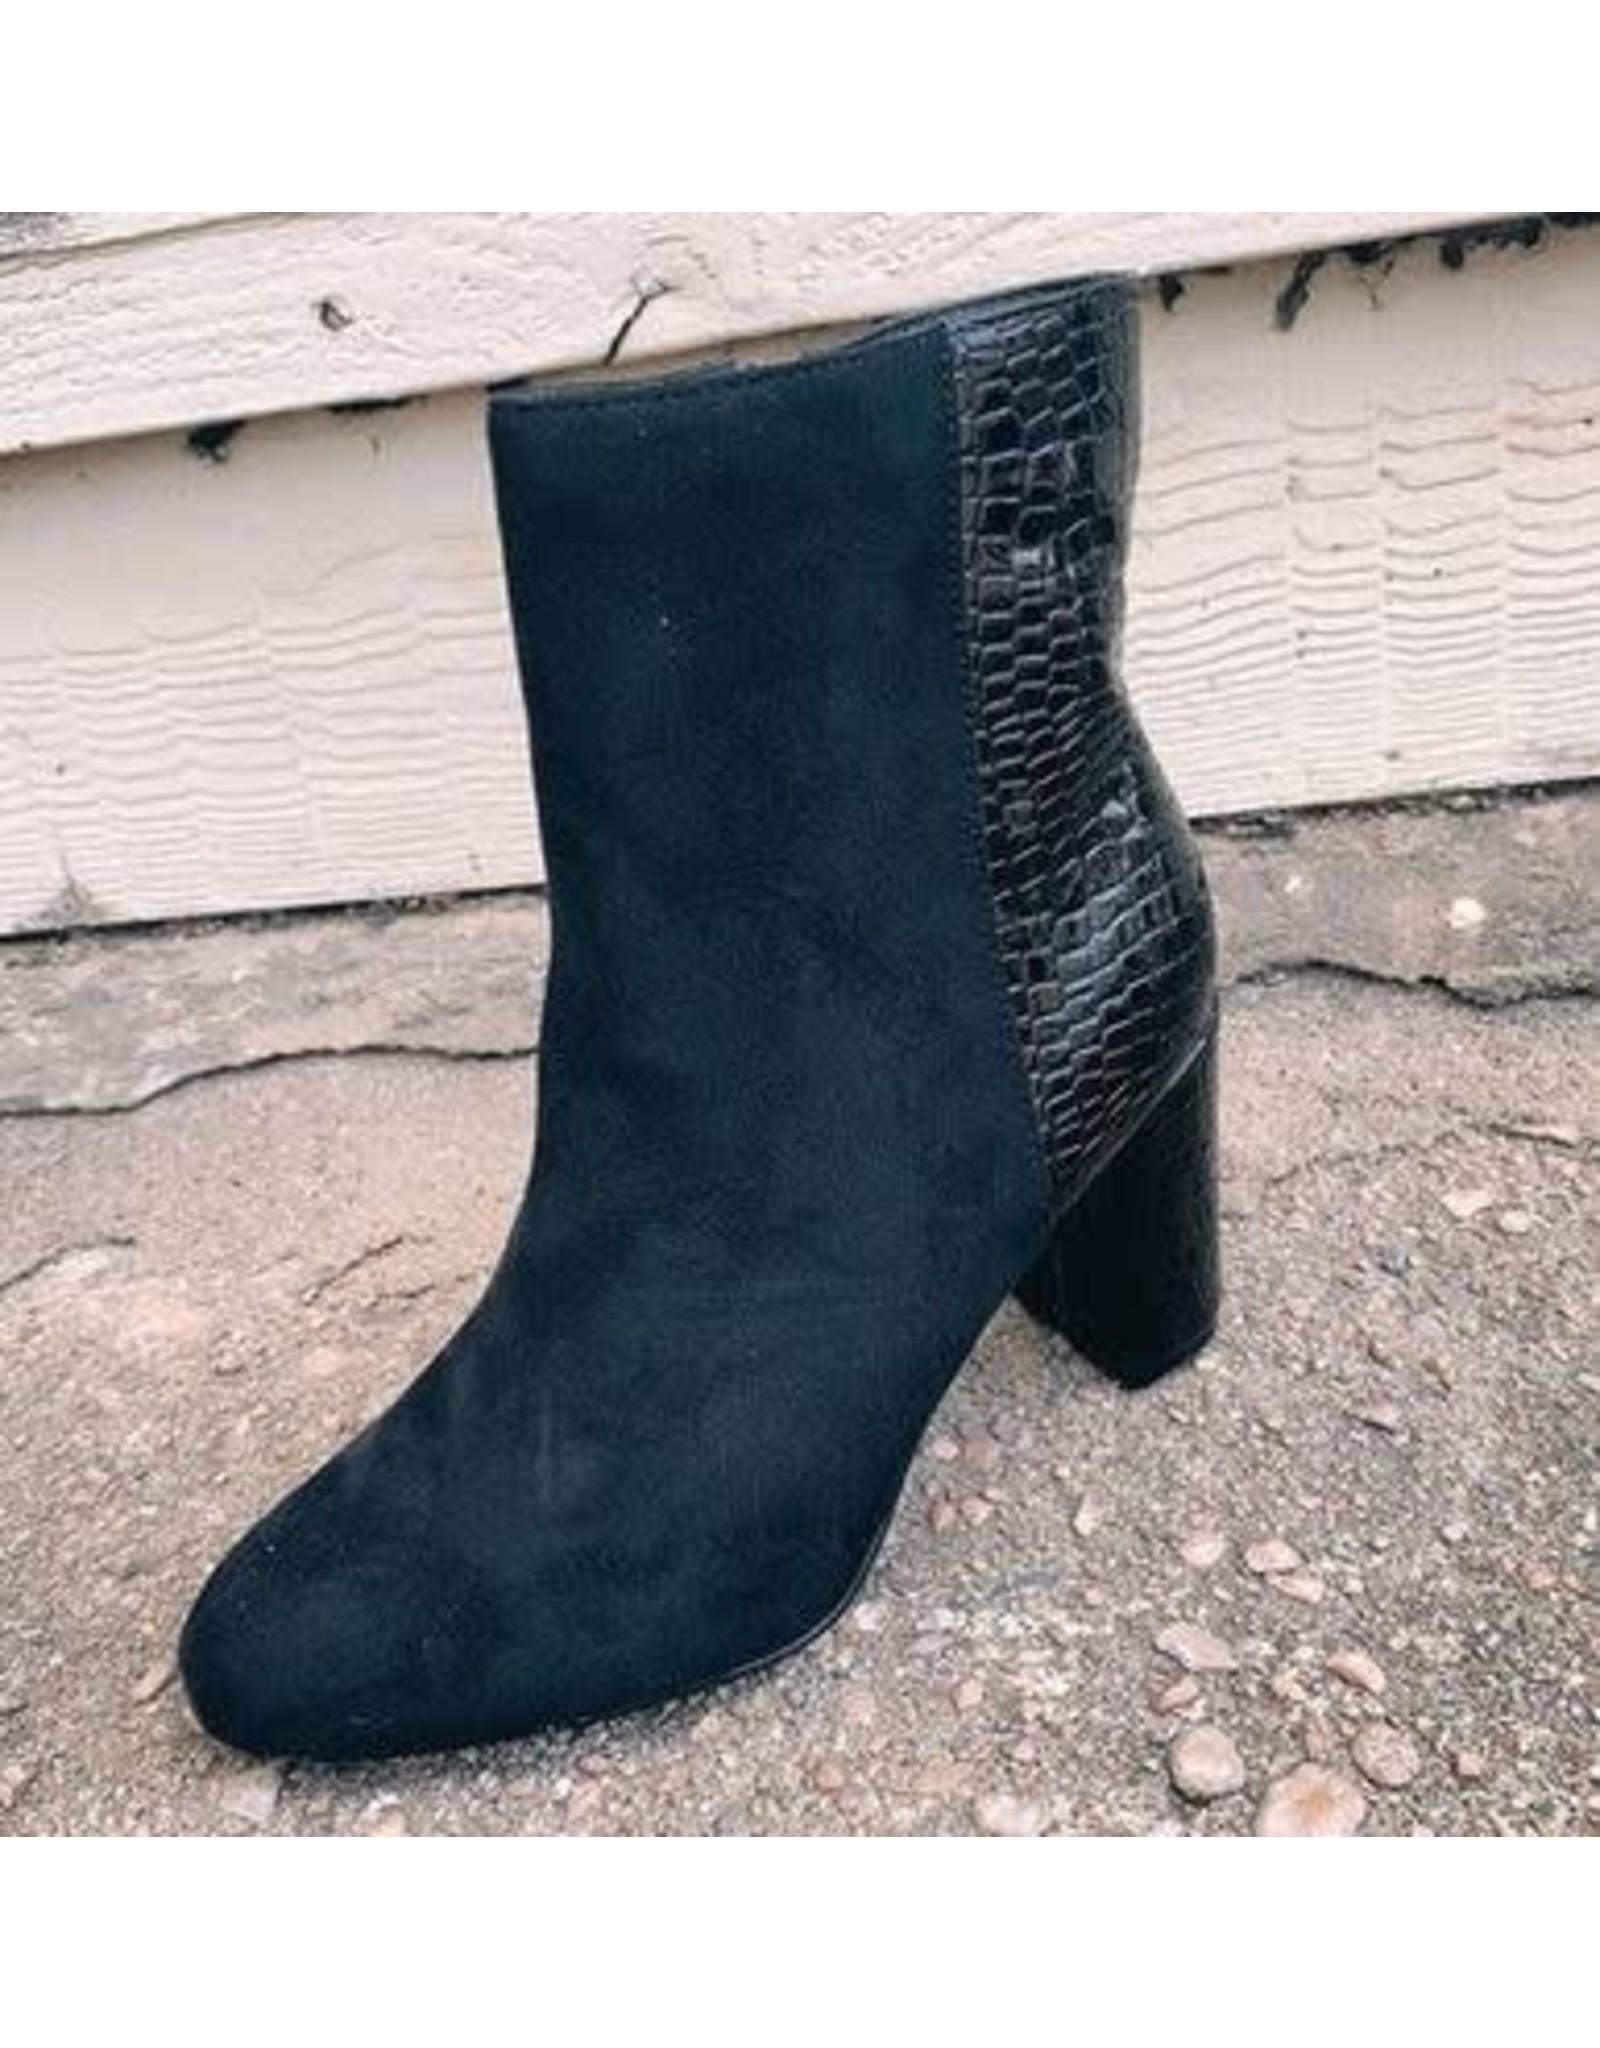 Camel Threads Chilton Black Boot